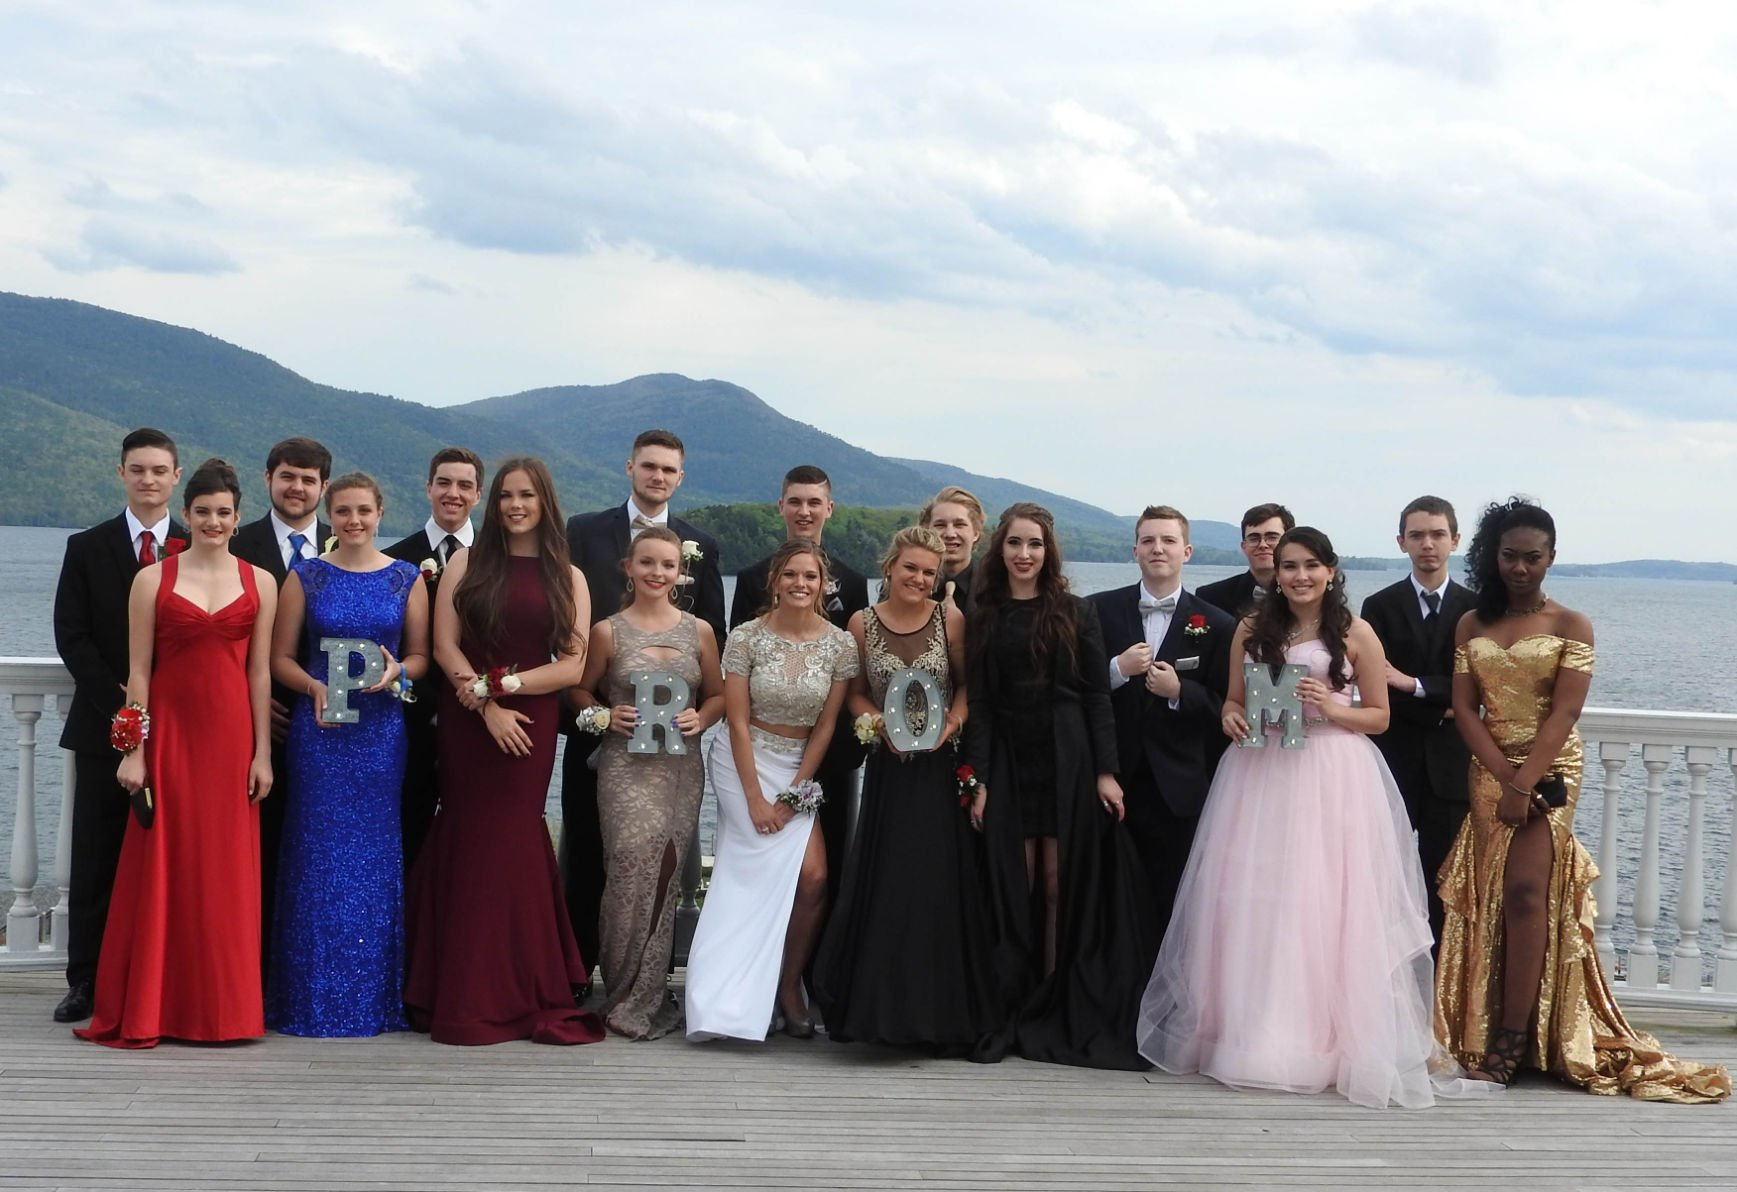 Prom yearbook | Lifestyles | poststar.com